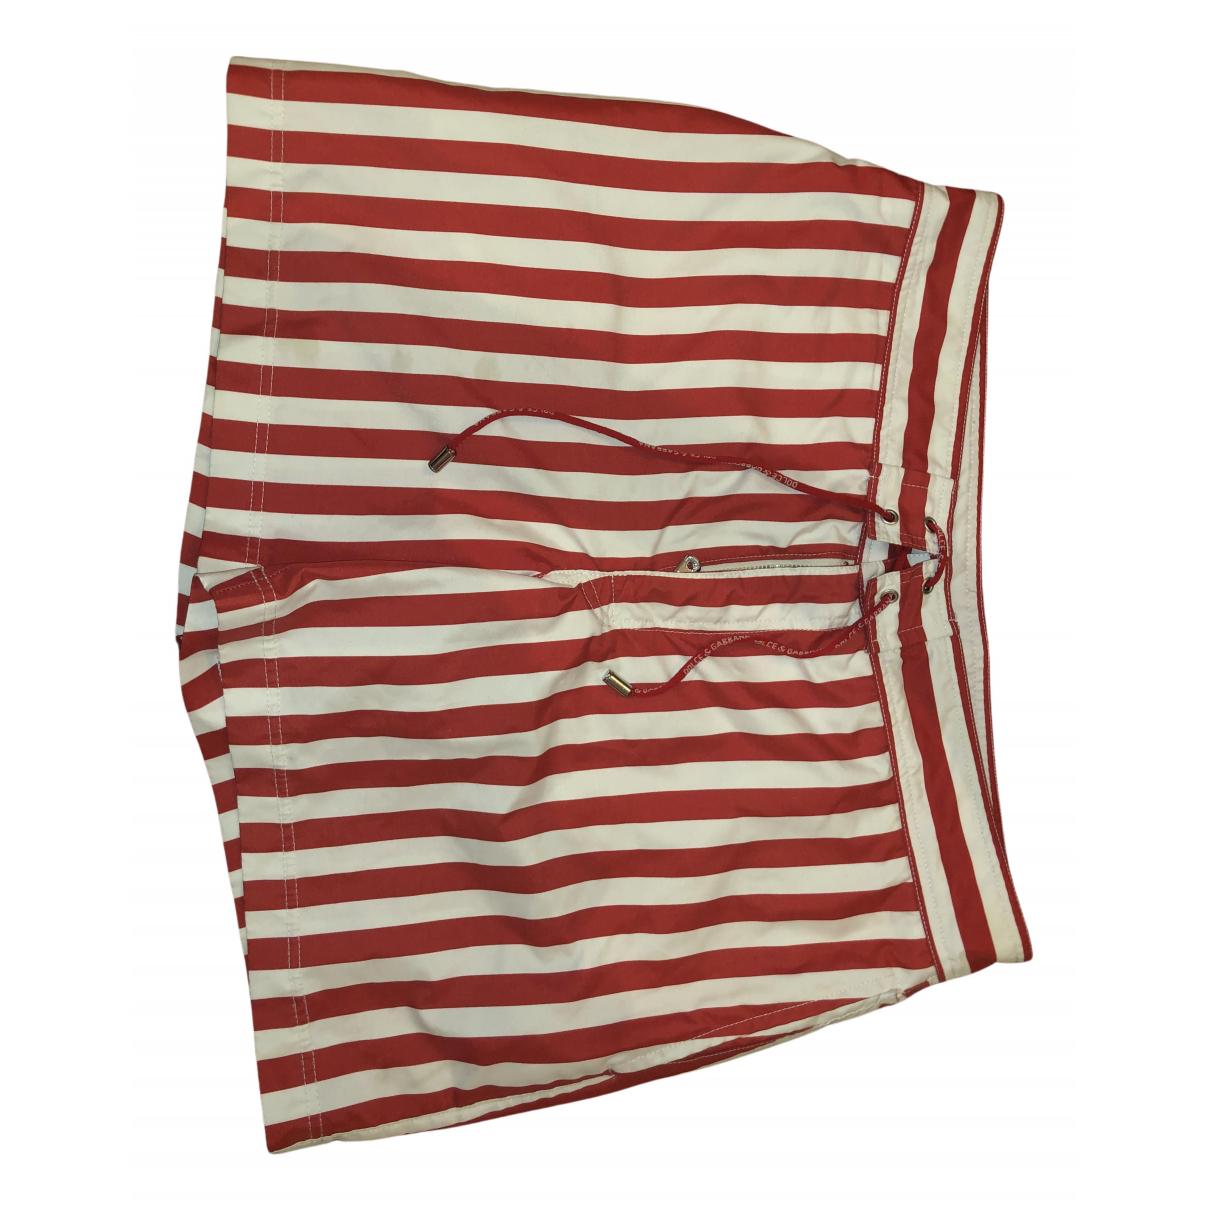 Dolce & Gabbana N Red Cotton - elasthane Swimwear for Men S International